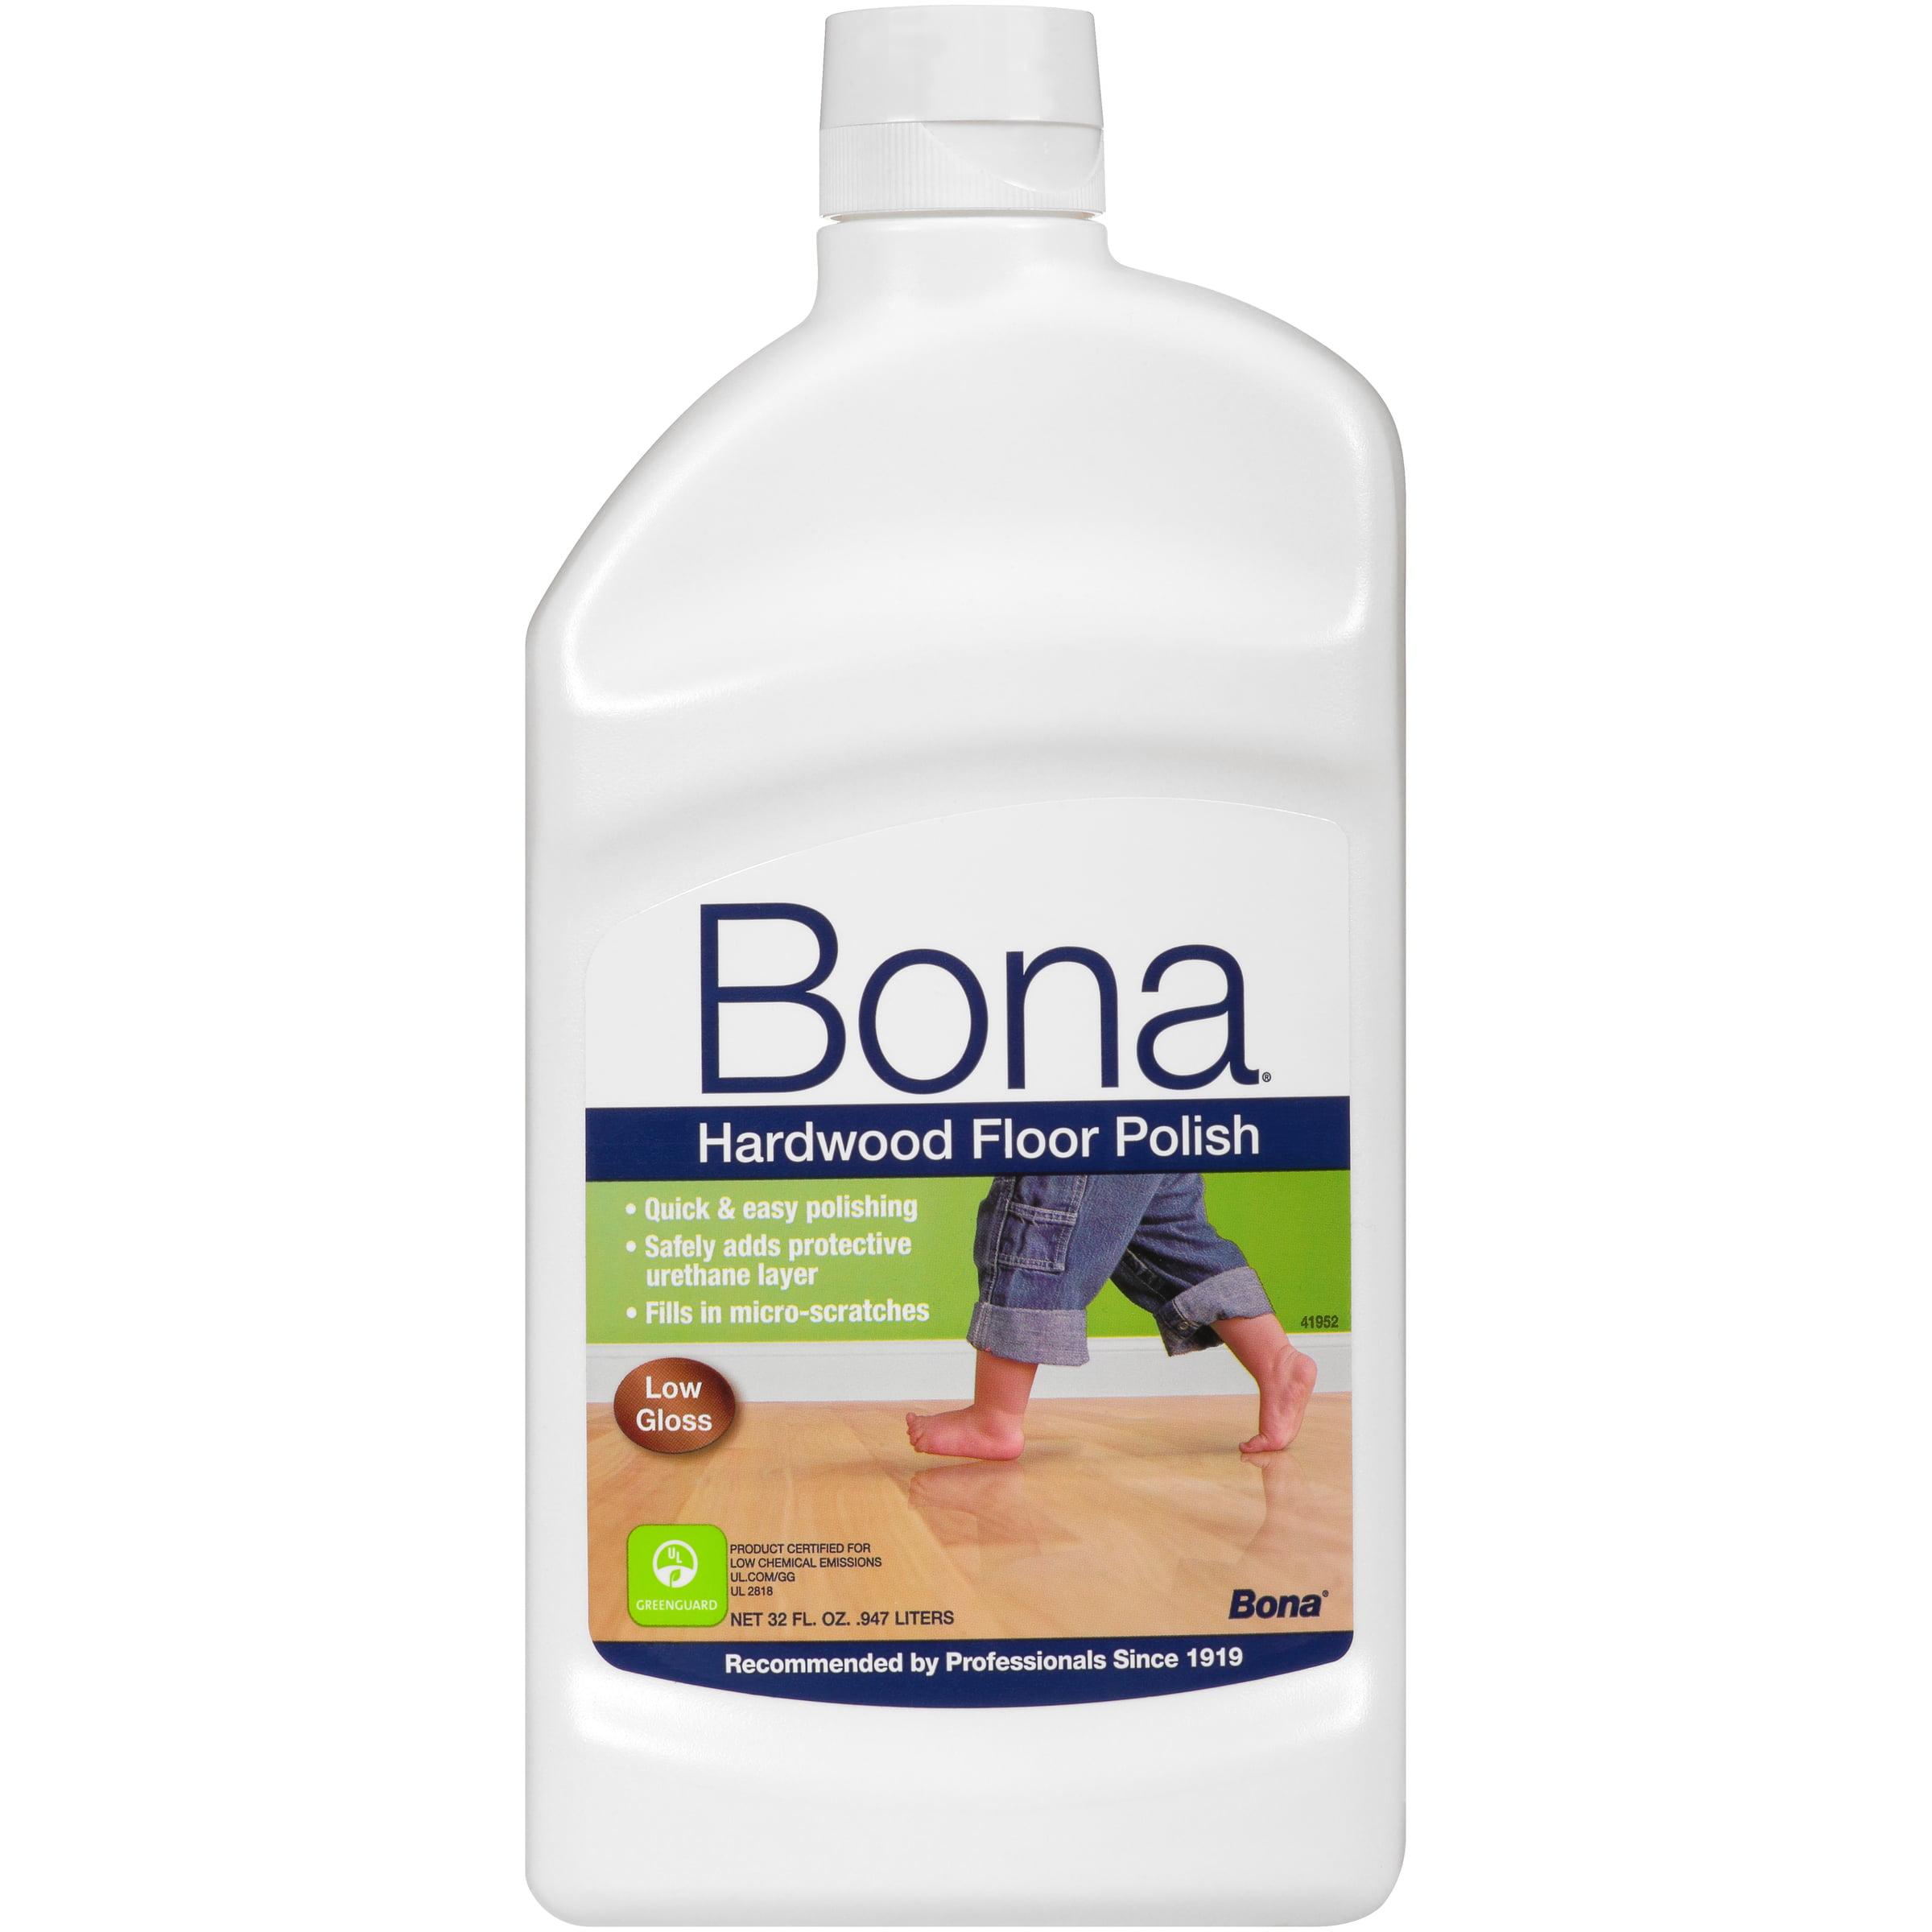 Bona® Hardwood Floor Polish - Low Gloss